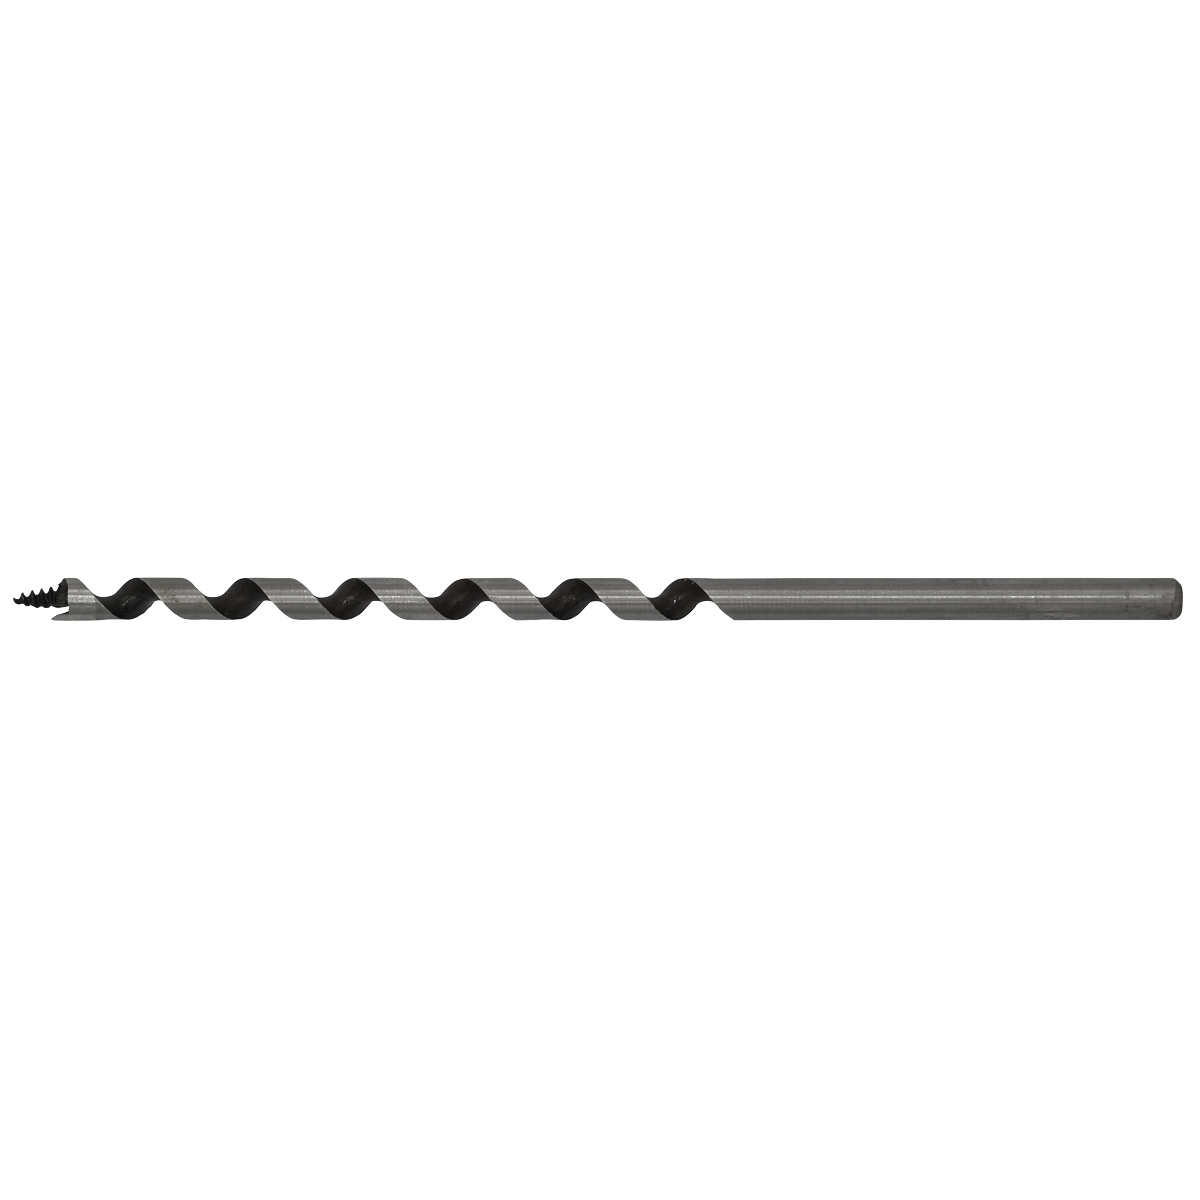 Auger Wood Drill Bit Ø6 x 155mm